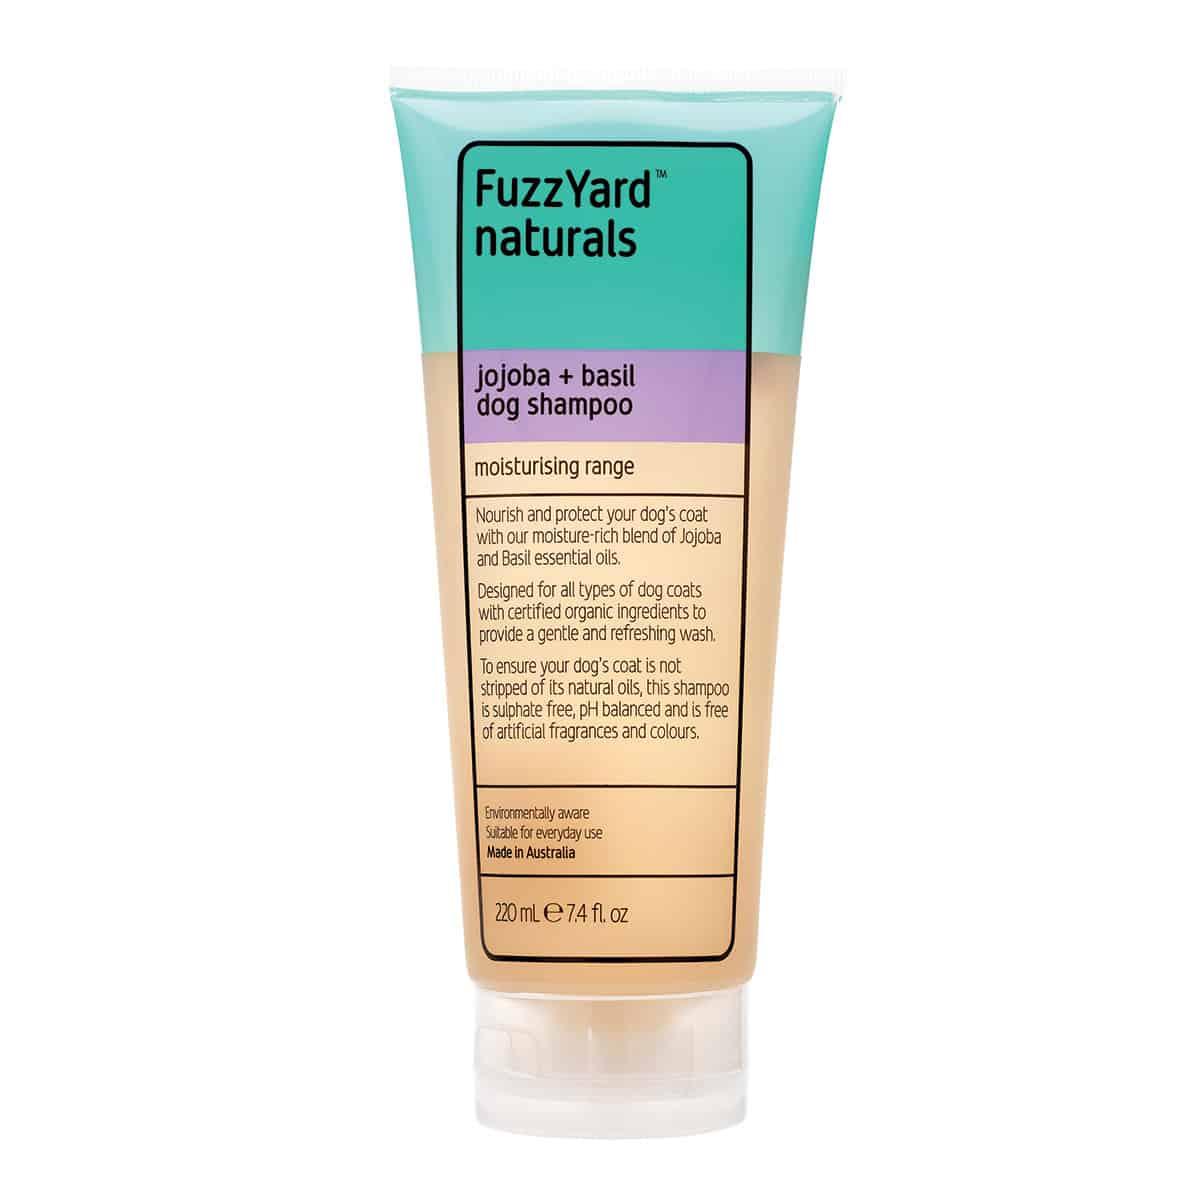 Fuzzyard Naturals - Moisturising Shampoo